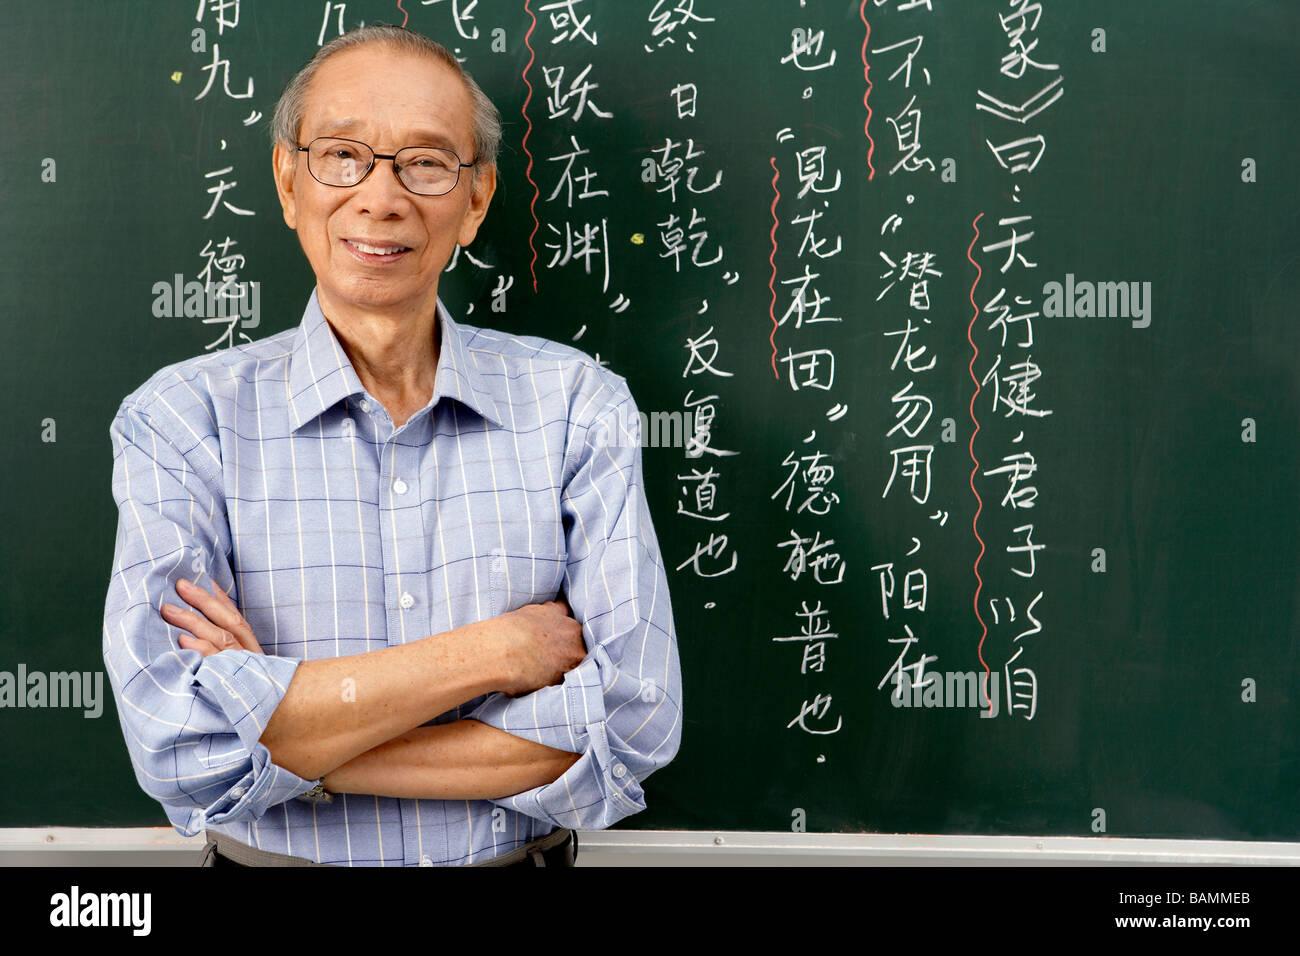 Teacher Standing By Blackboard, Arms Folded - Stock Image